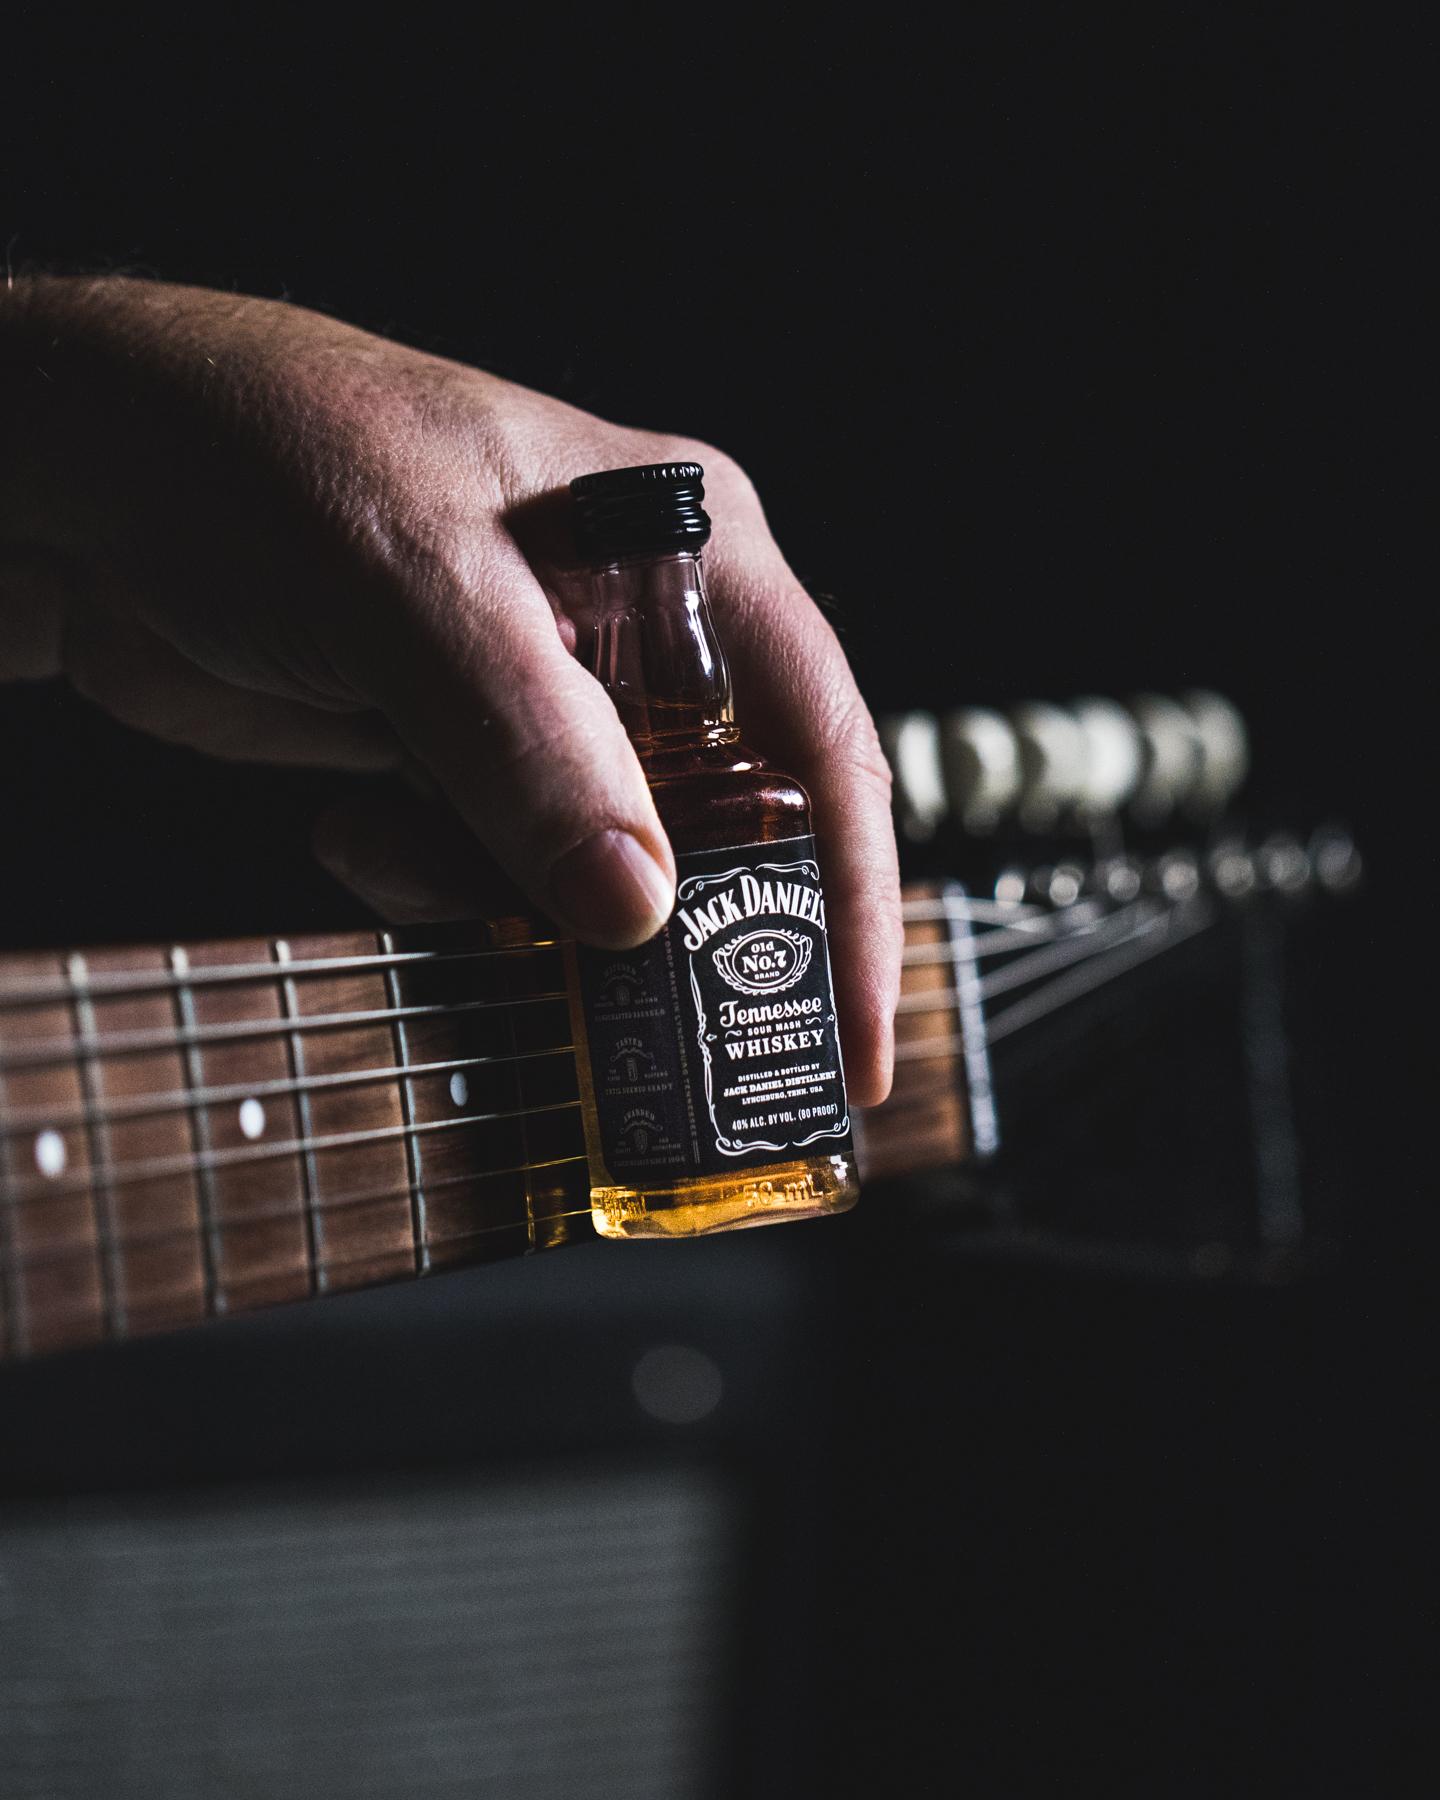 https://www.promotionmagazine.it/wp/wp-content/uploads/2020/09/Jack-Daniels-Every-Drop-Music-Guitar-Neck.jpg